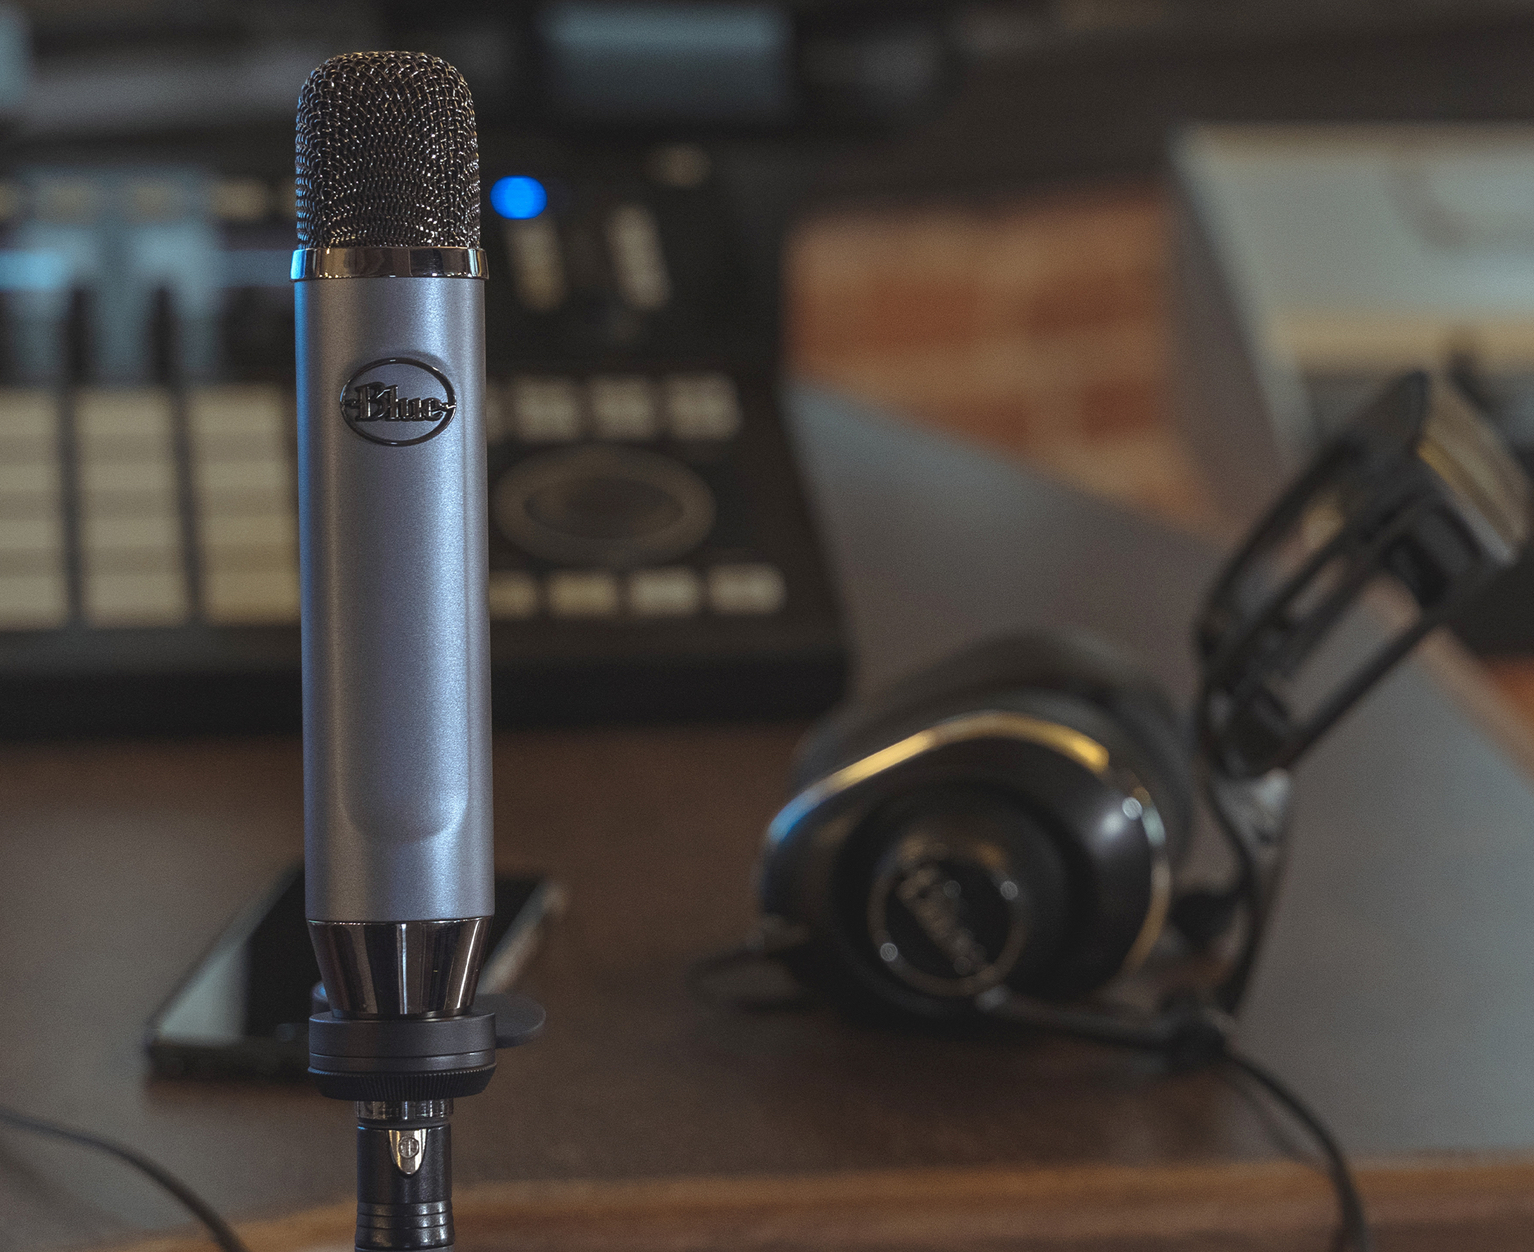 Blue, Blue Microphones, Blue Headphones, Microphones, Headphone